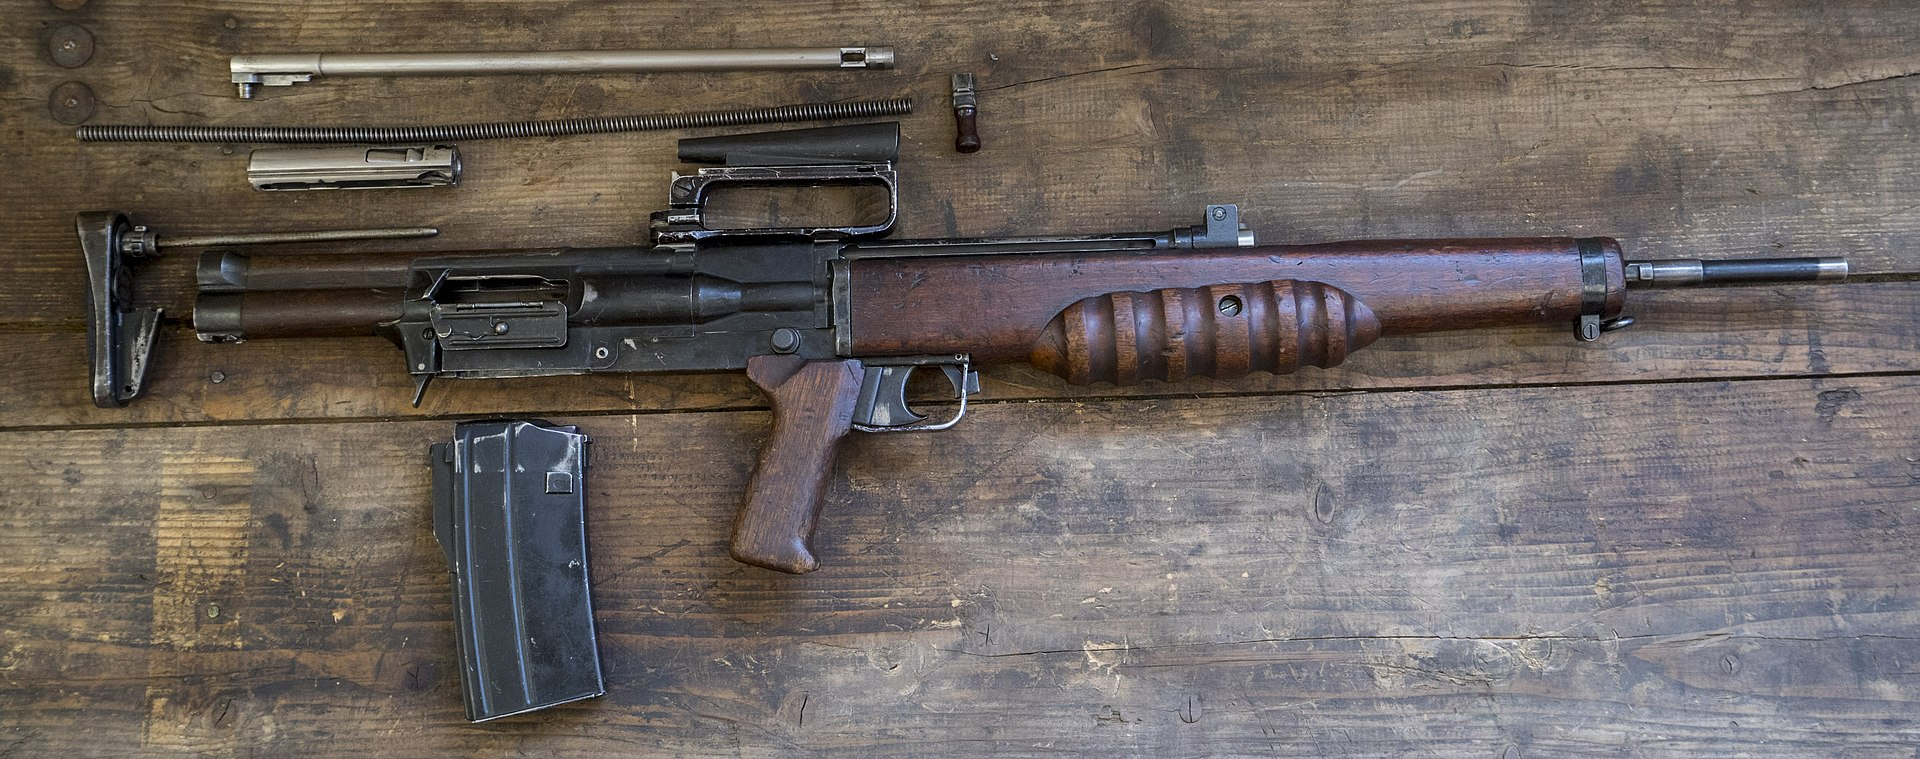 1920px-British_Assault_Rifles_MOD_45162602.jpg